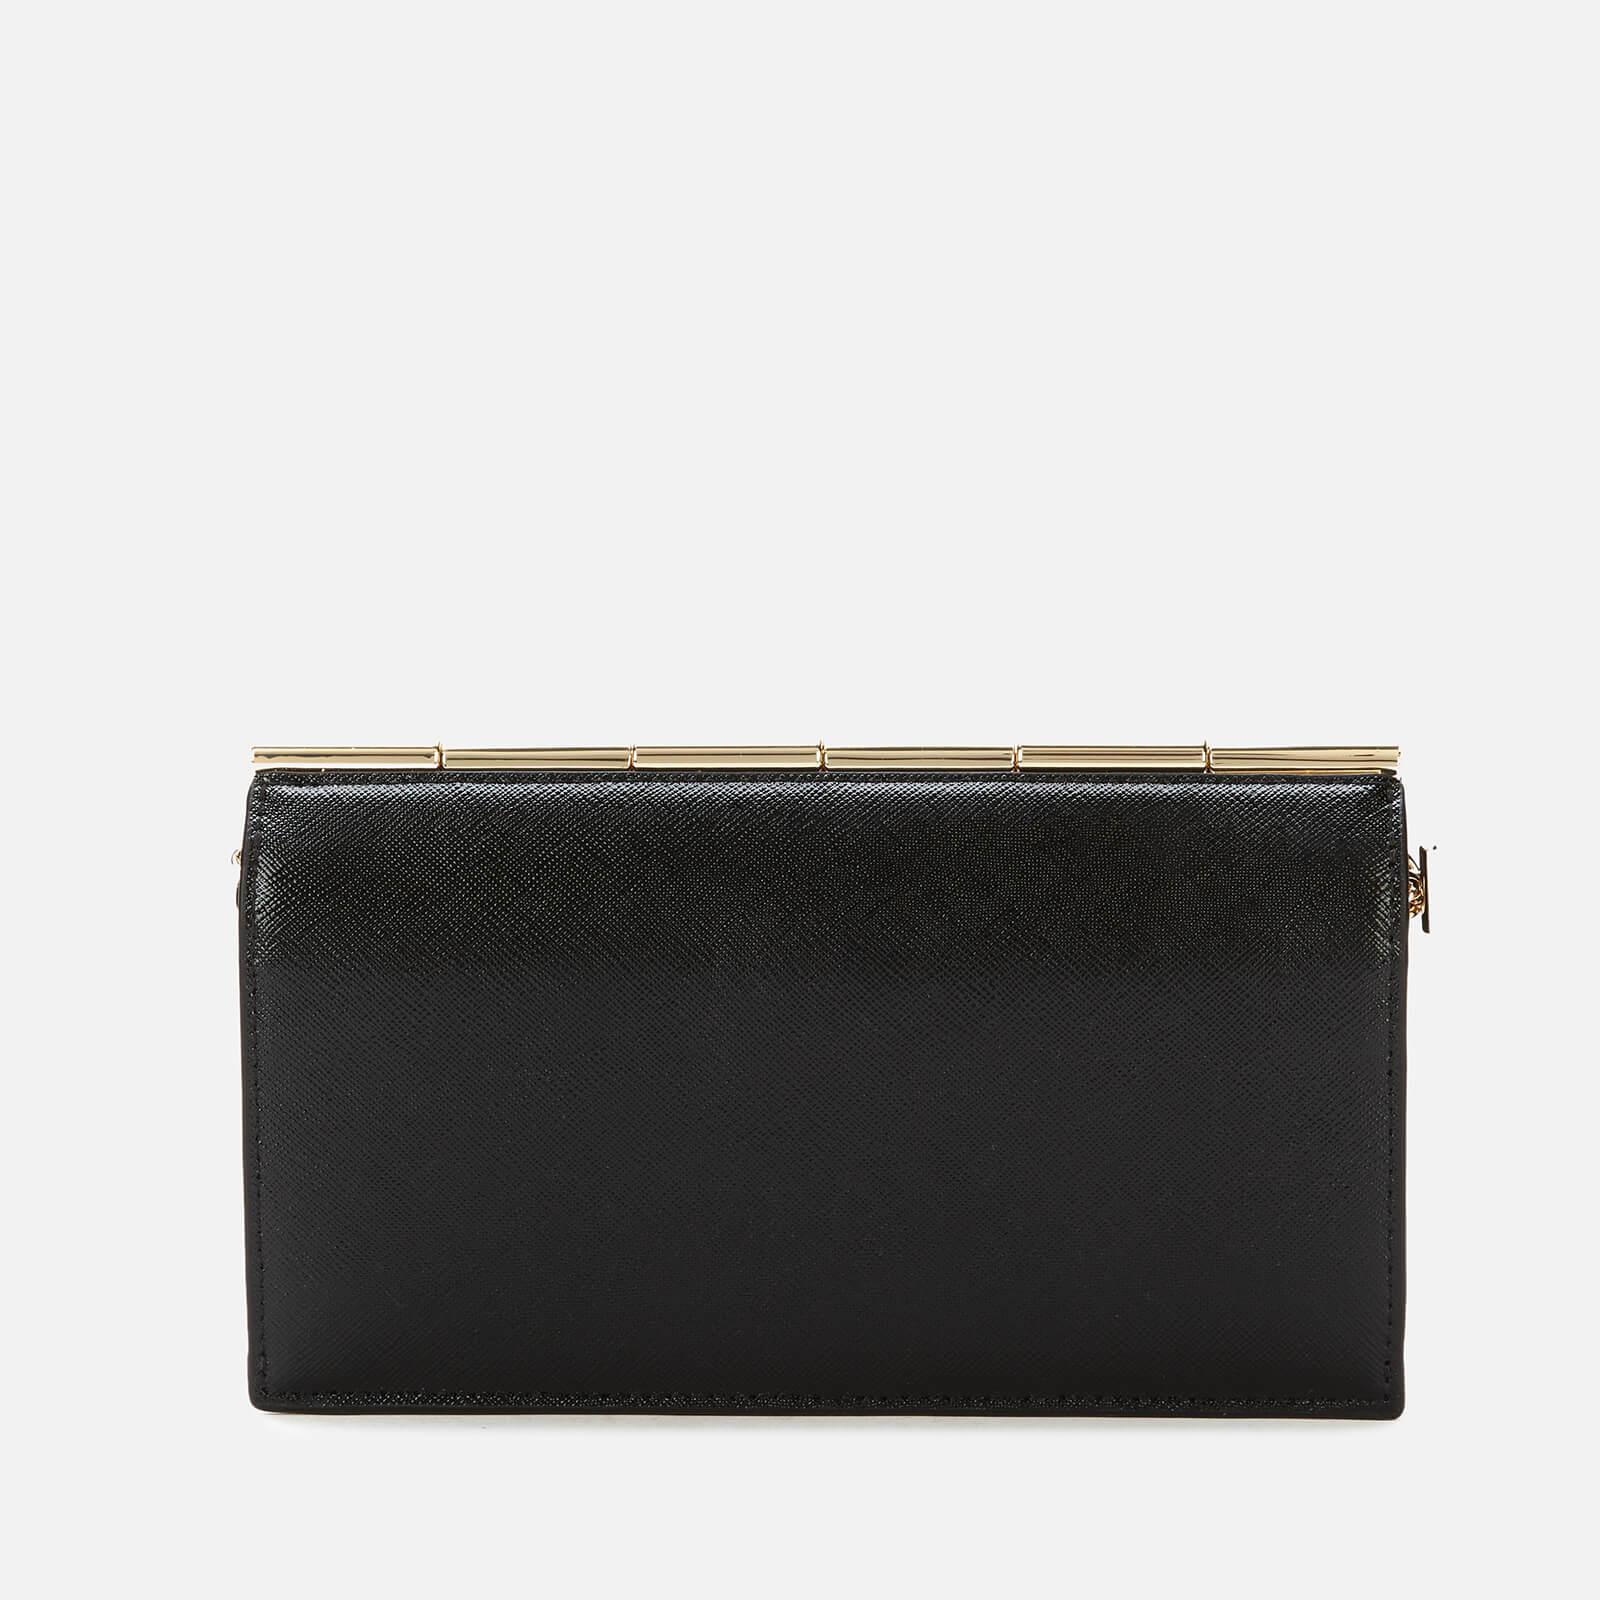 Dkny Women's Heidi Convertible Wallet - Black